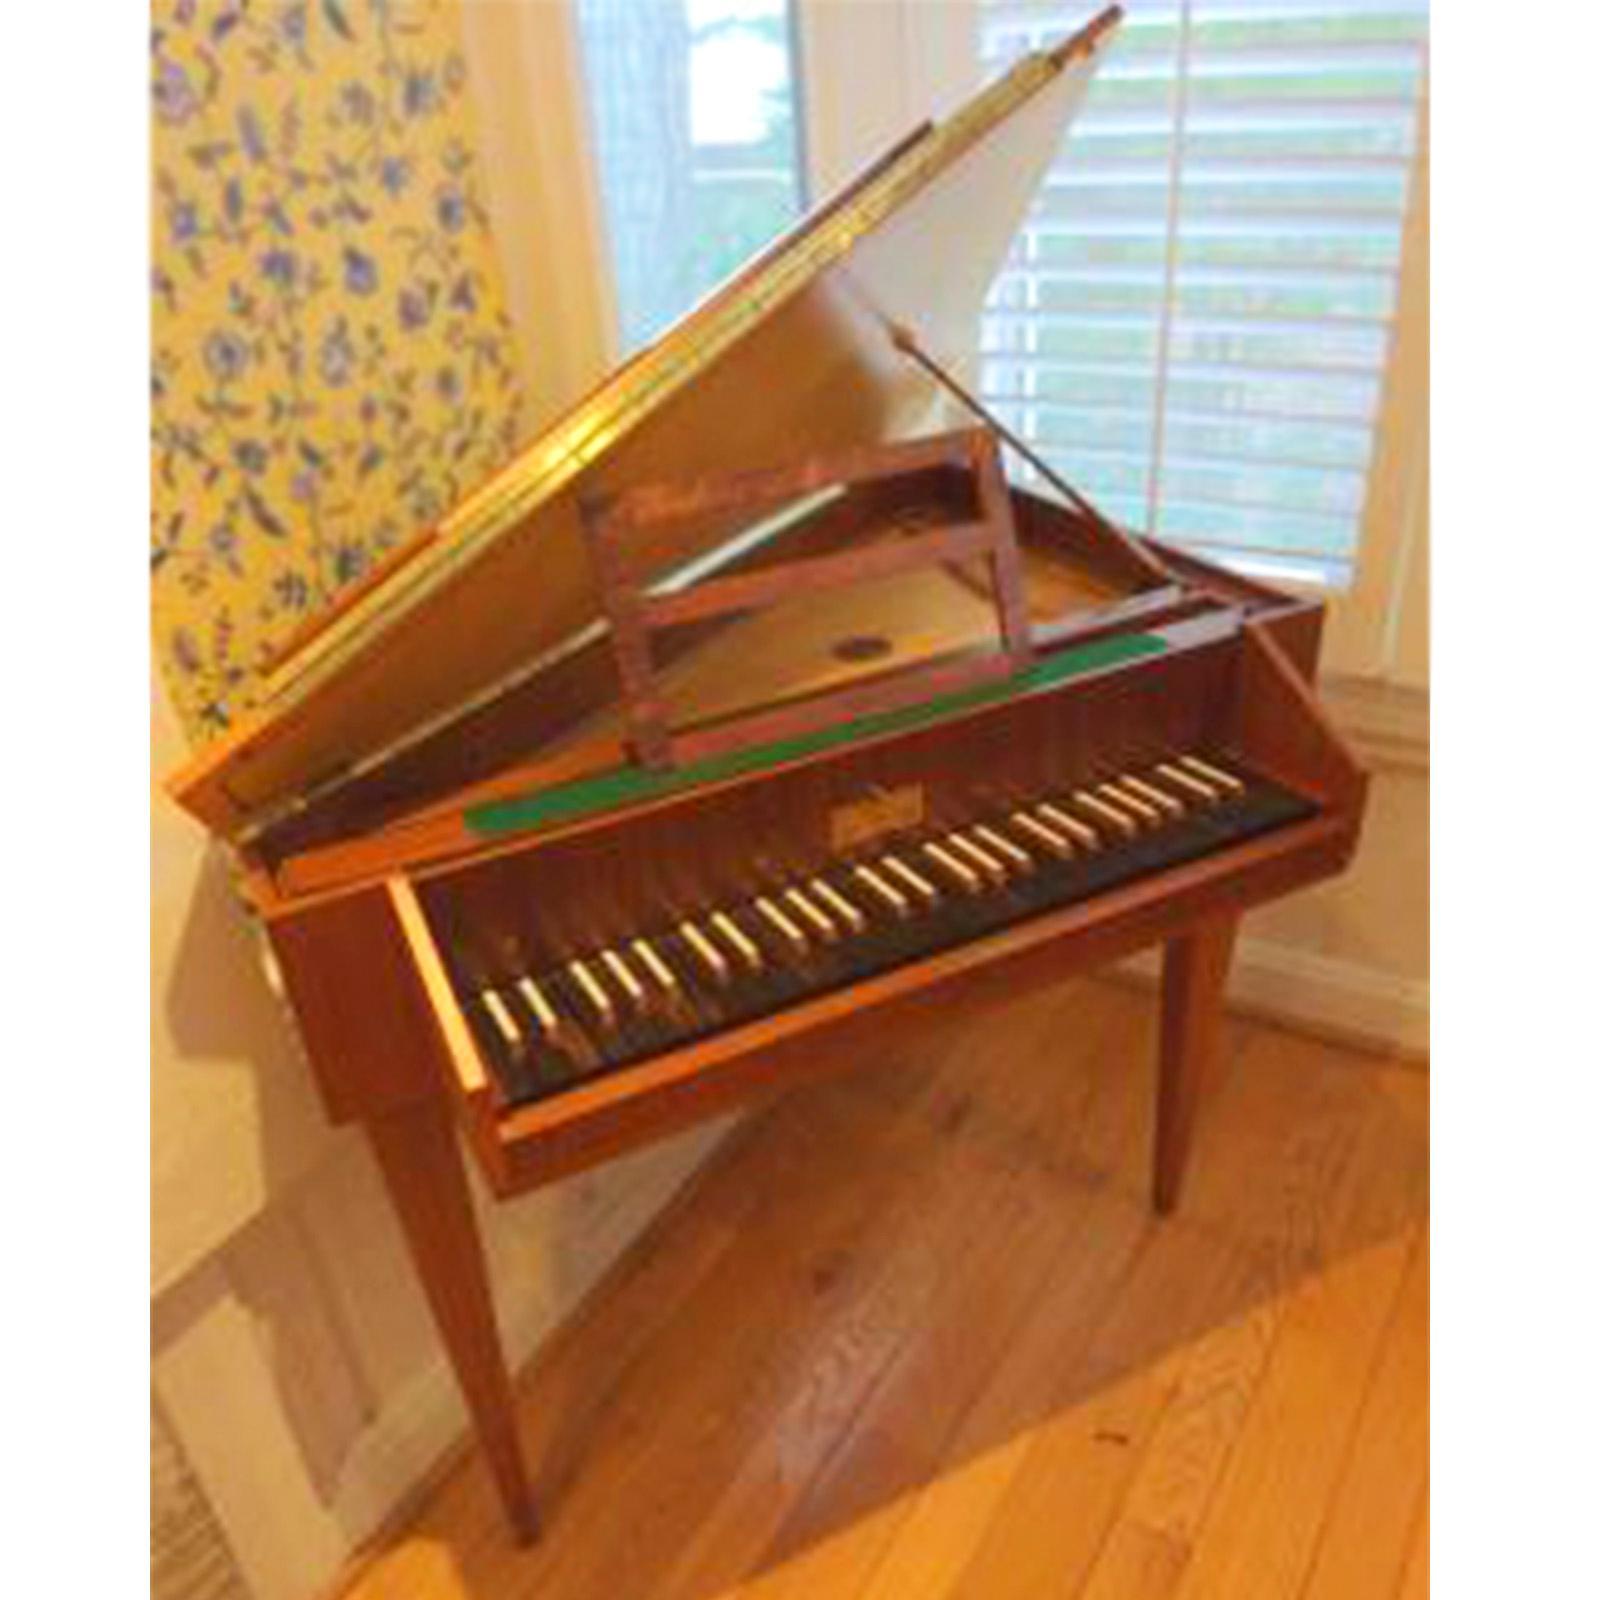 Sperrhake Passau portable single manual harpsichord serial #74062, satinwood case, made in Germany ca.1970s.